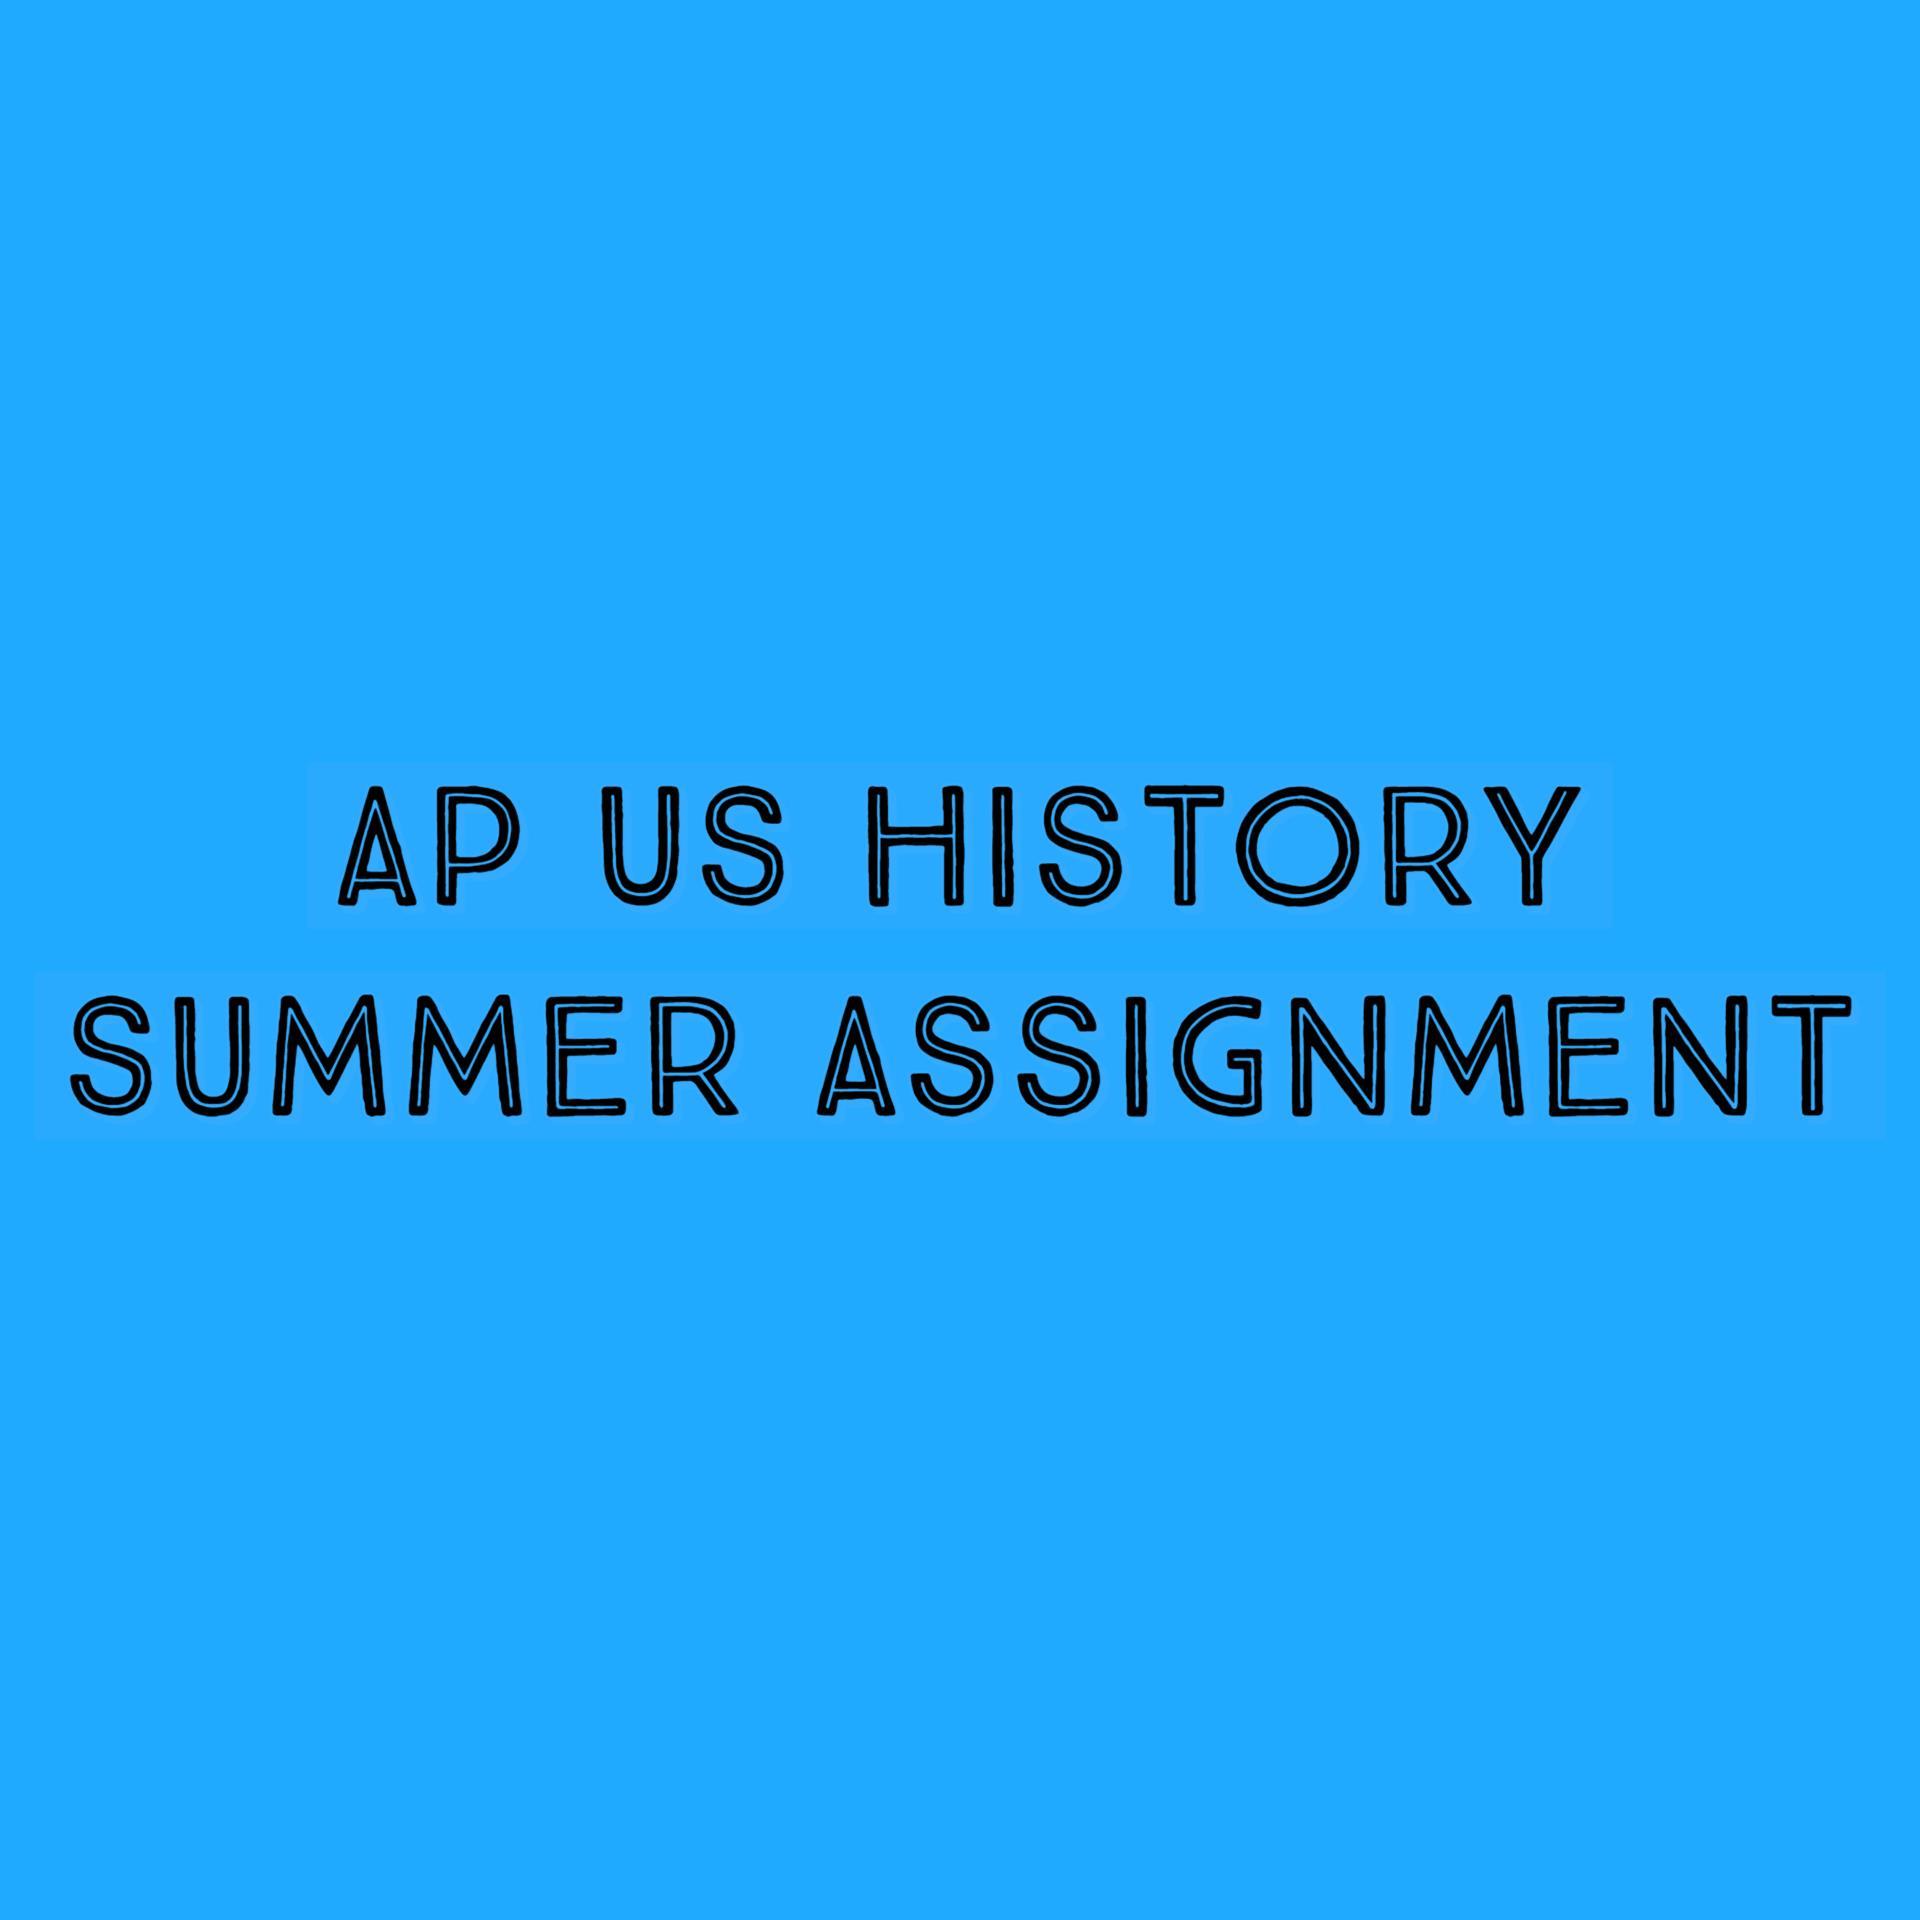 APUSH SUMMER